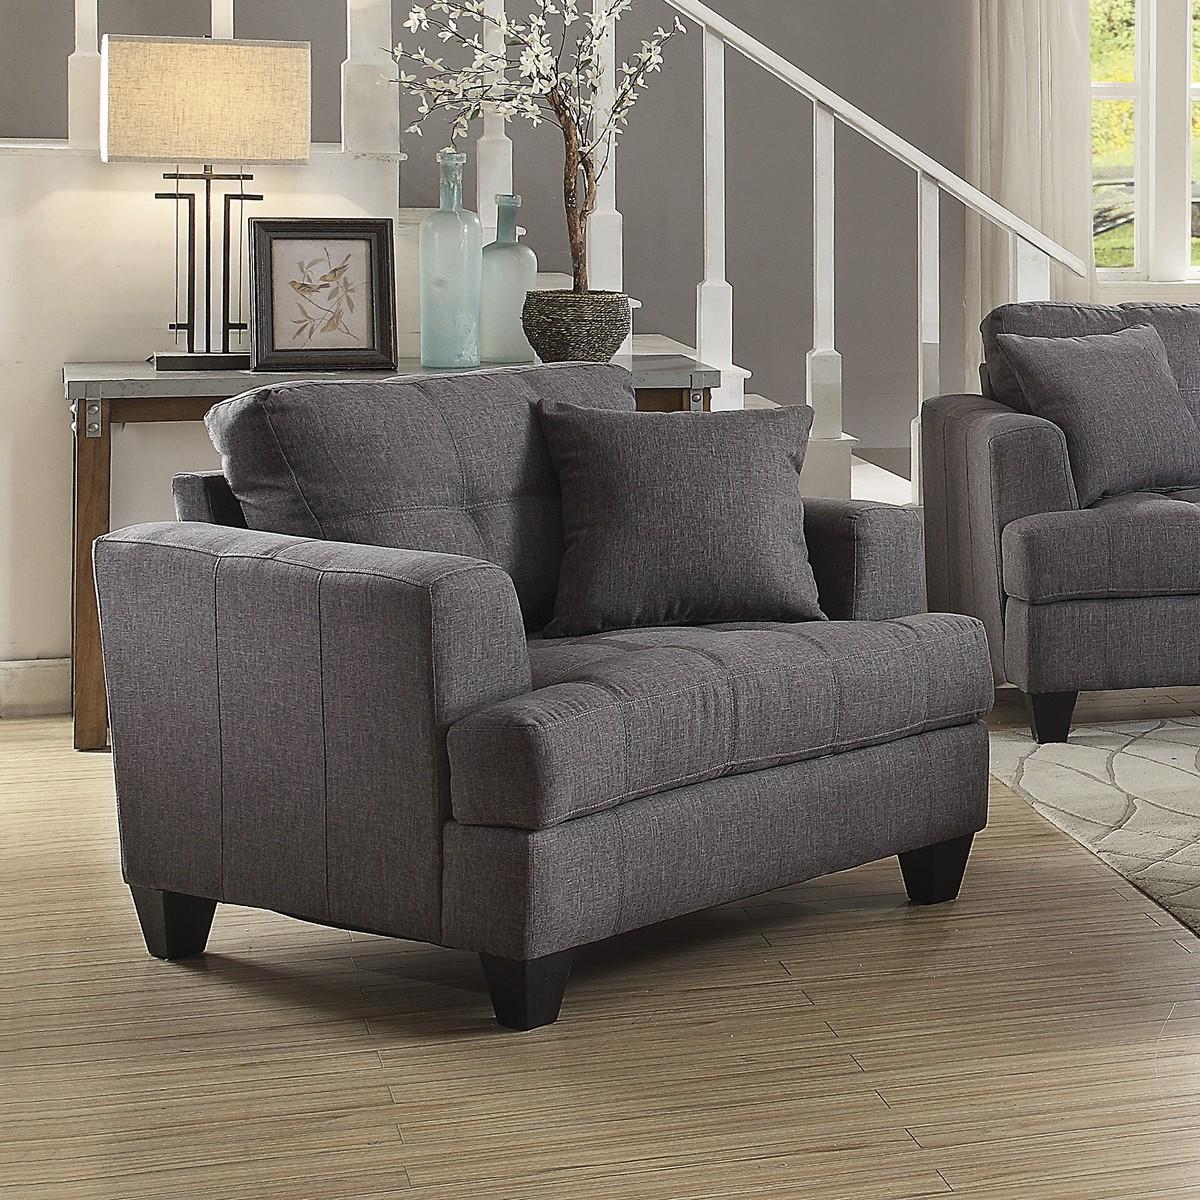 Coaster Samuel Chair - Charcoal